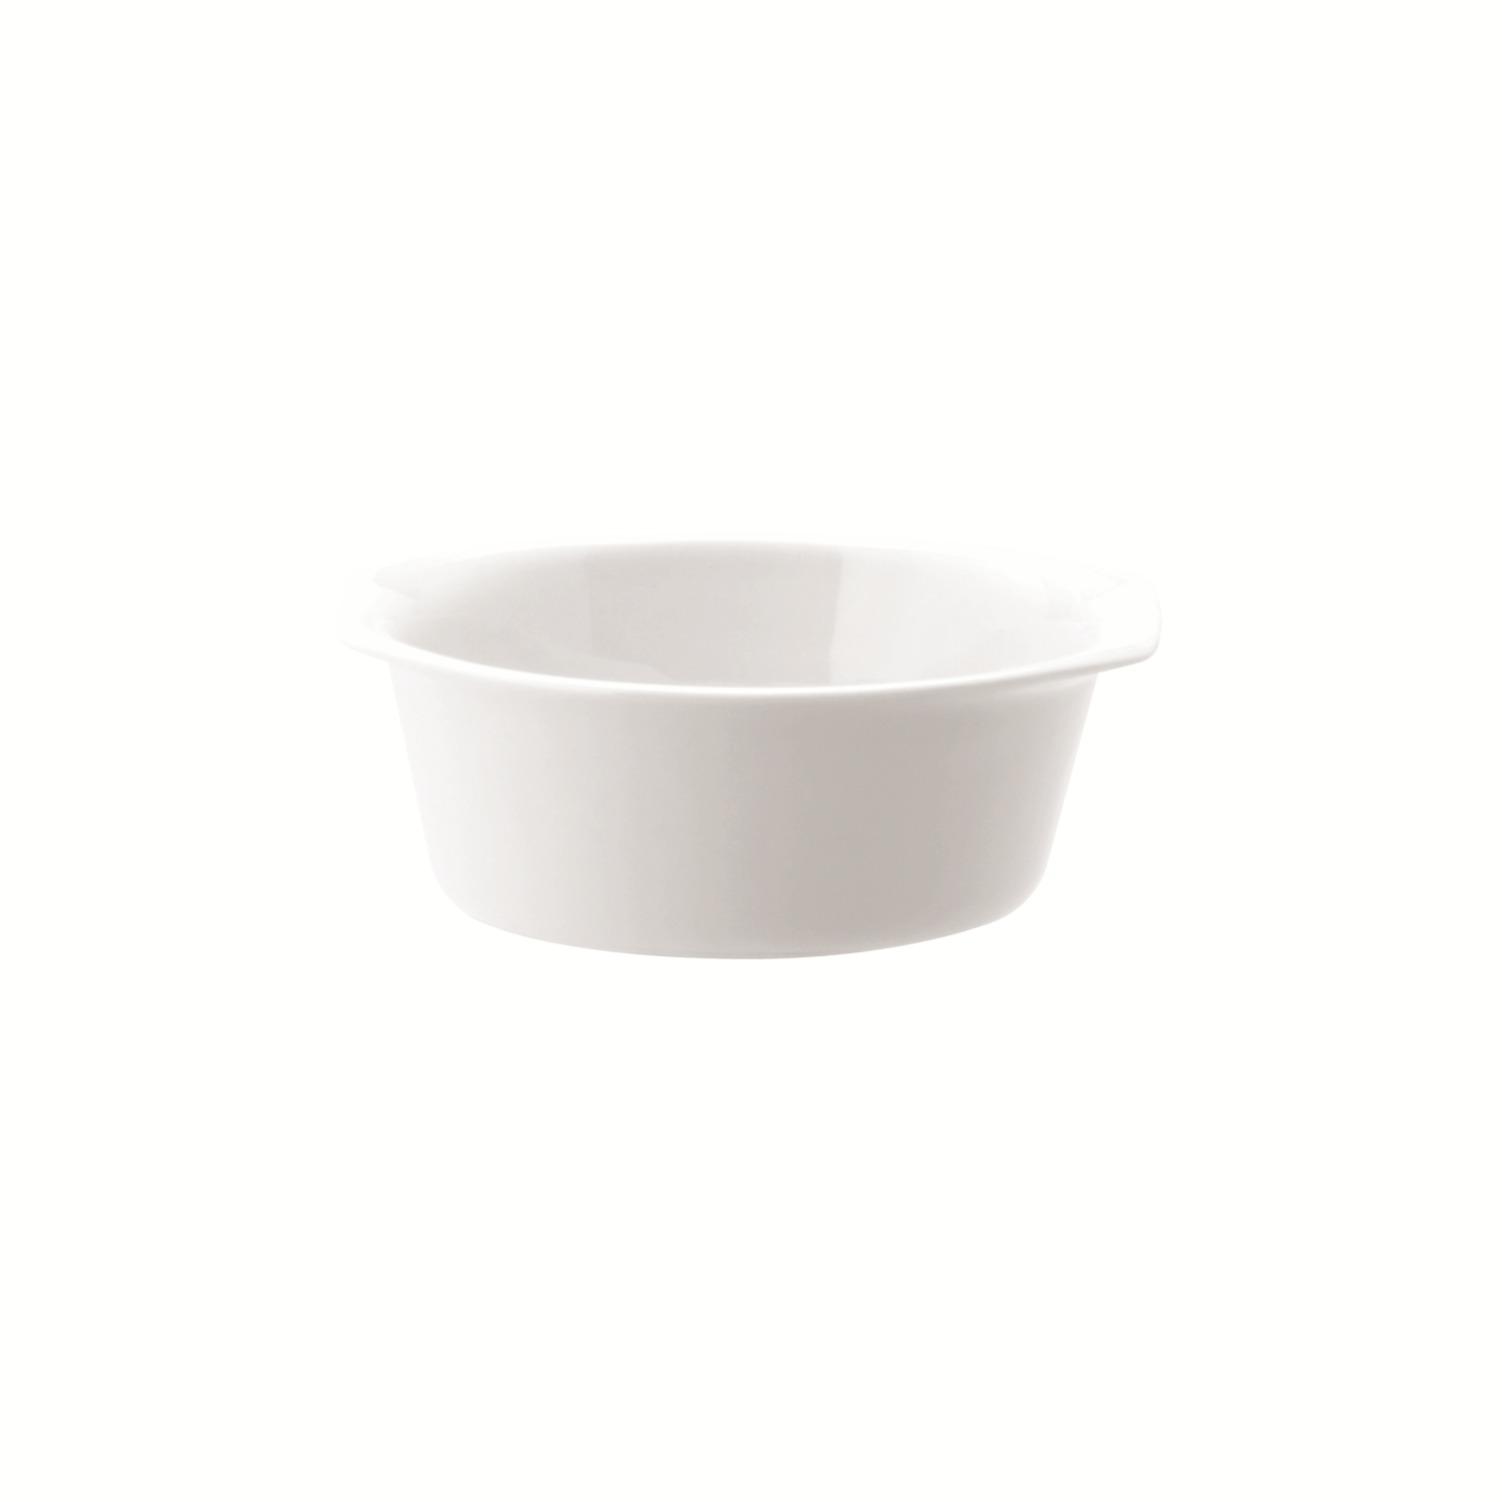 Travessa de Porcelana 16cm Redonda Funda Branca Calorama - Schmidt